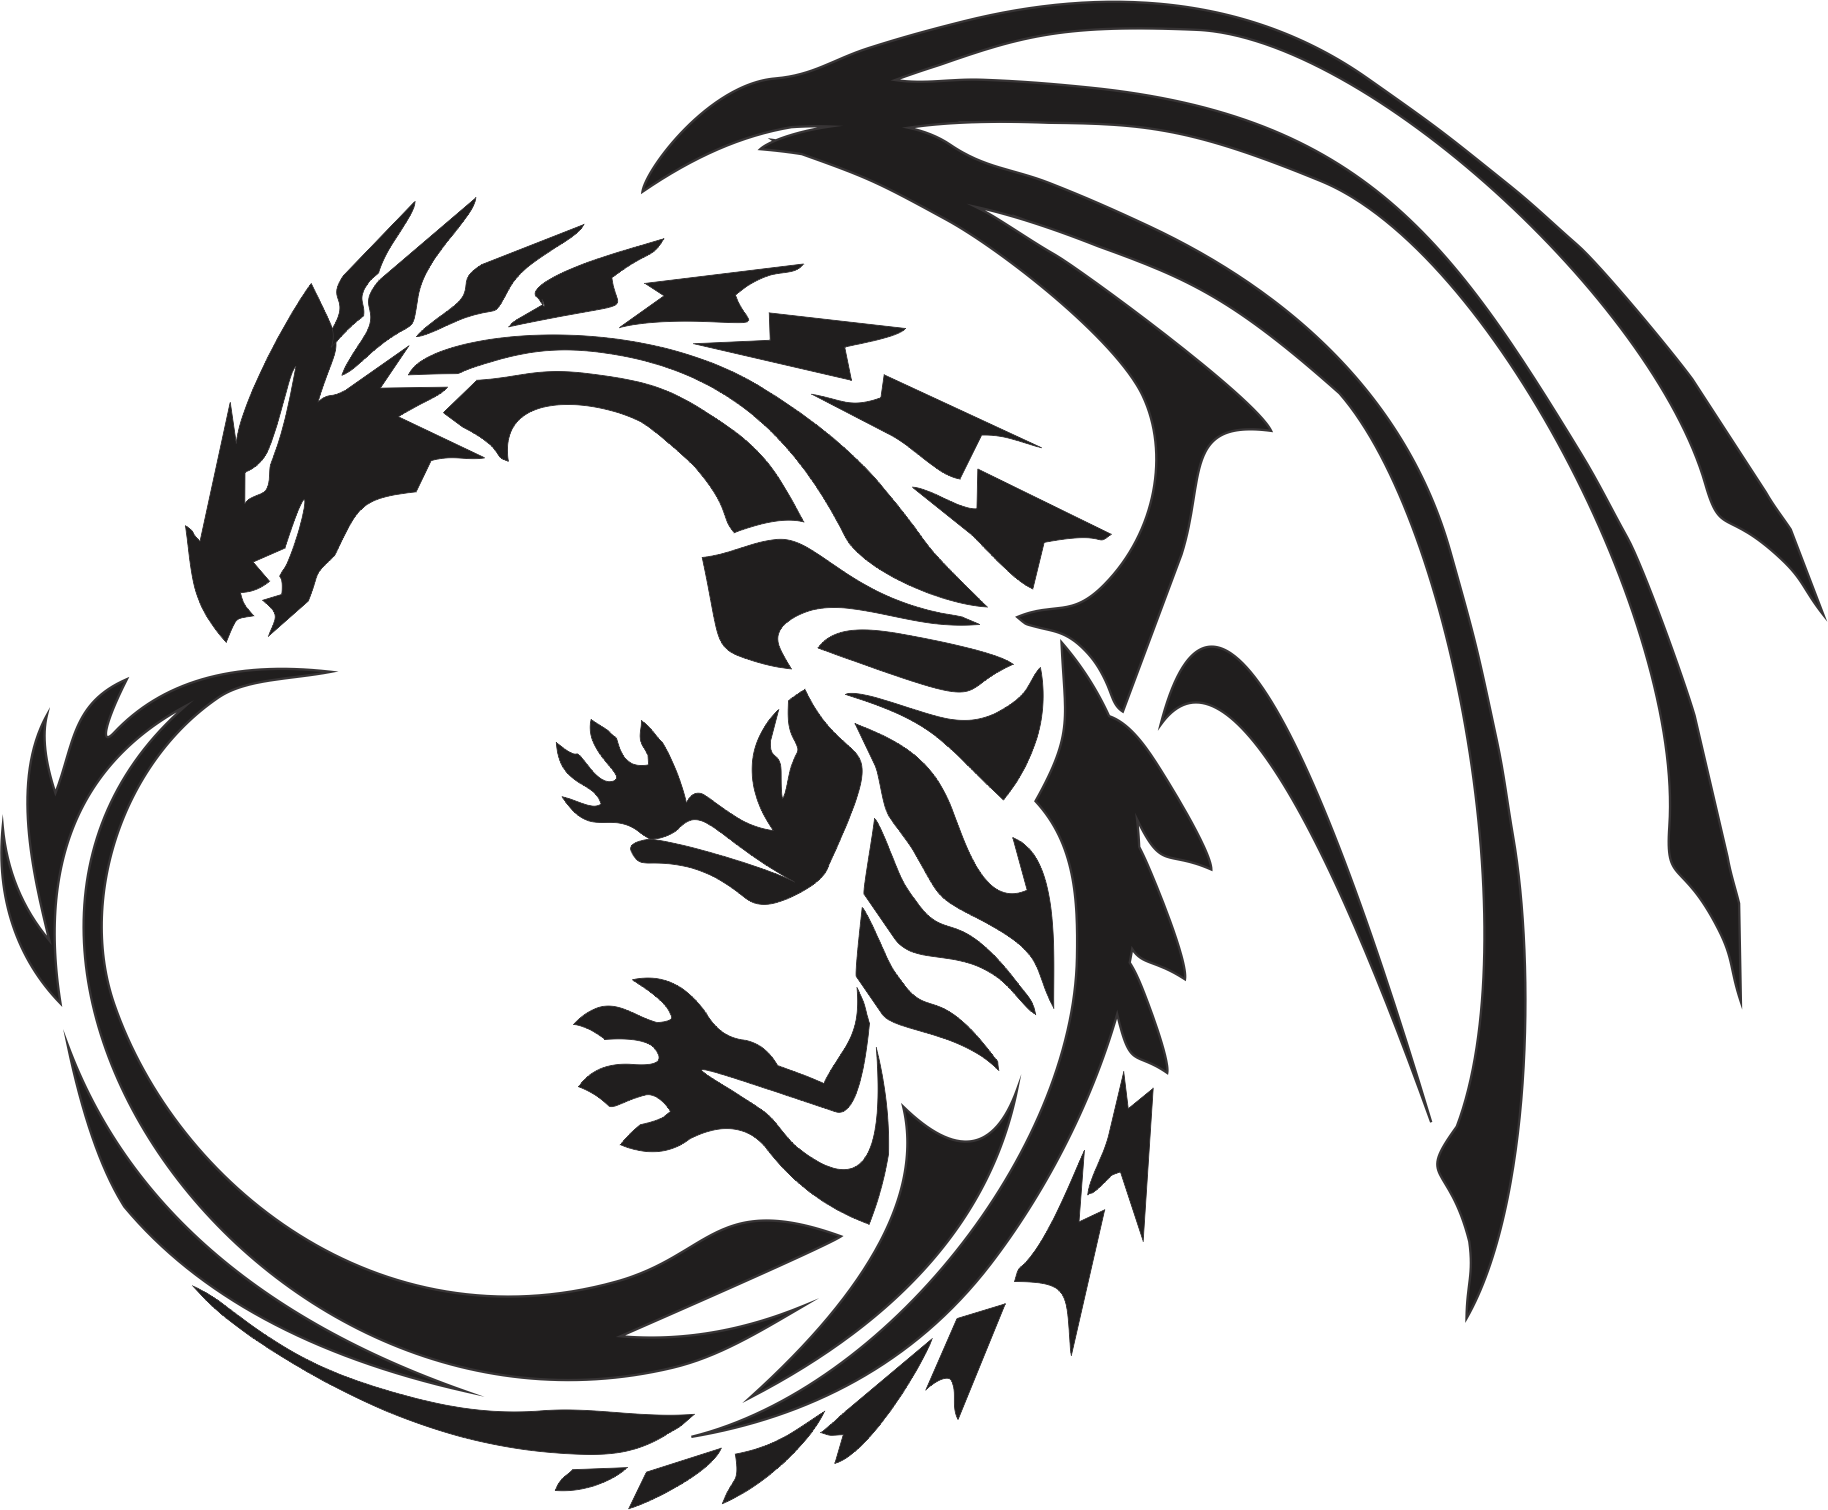 1828x1510 Download Dragon Tattoos Png Image Hq Png Image Freepngimg